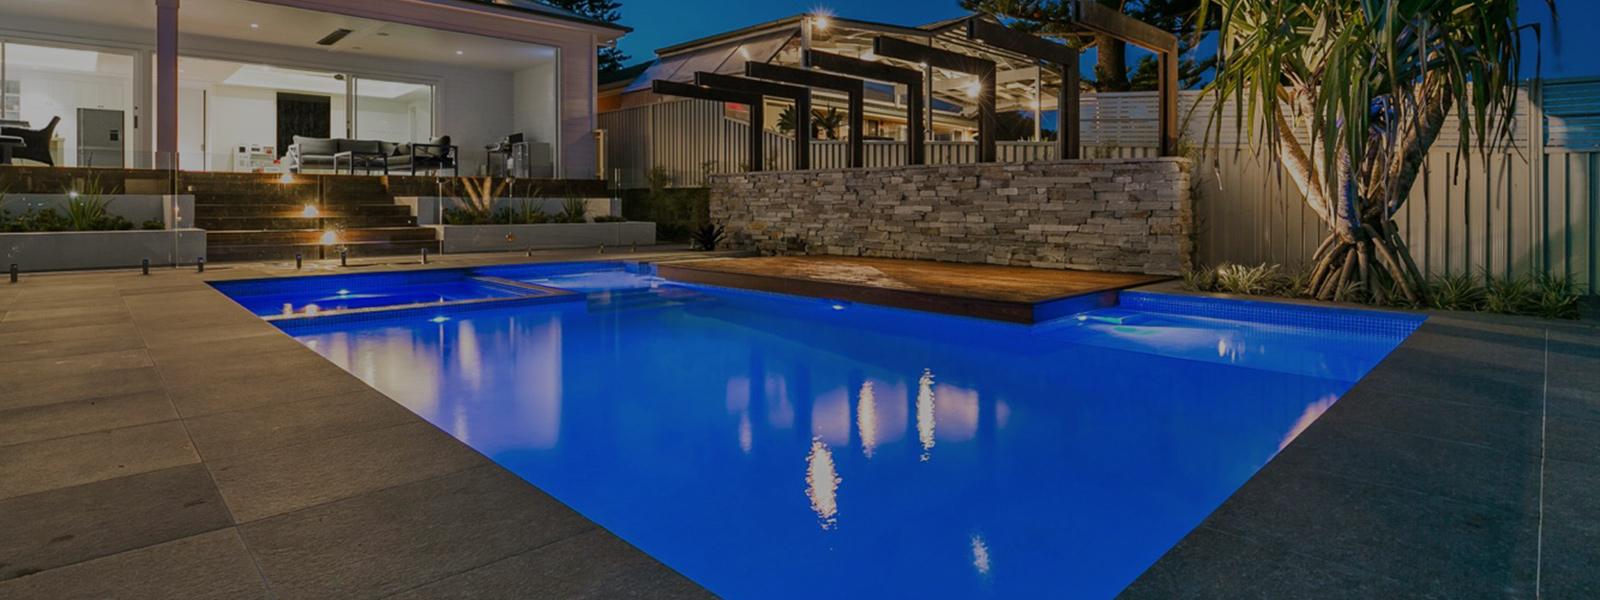 Elite pool spa renovations for Swimming pool resurfacing sydney